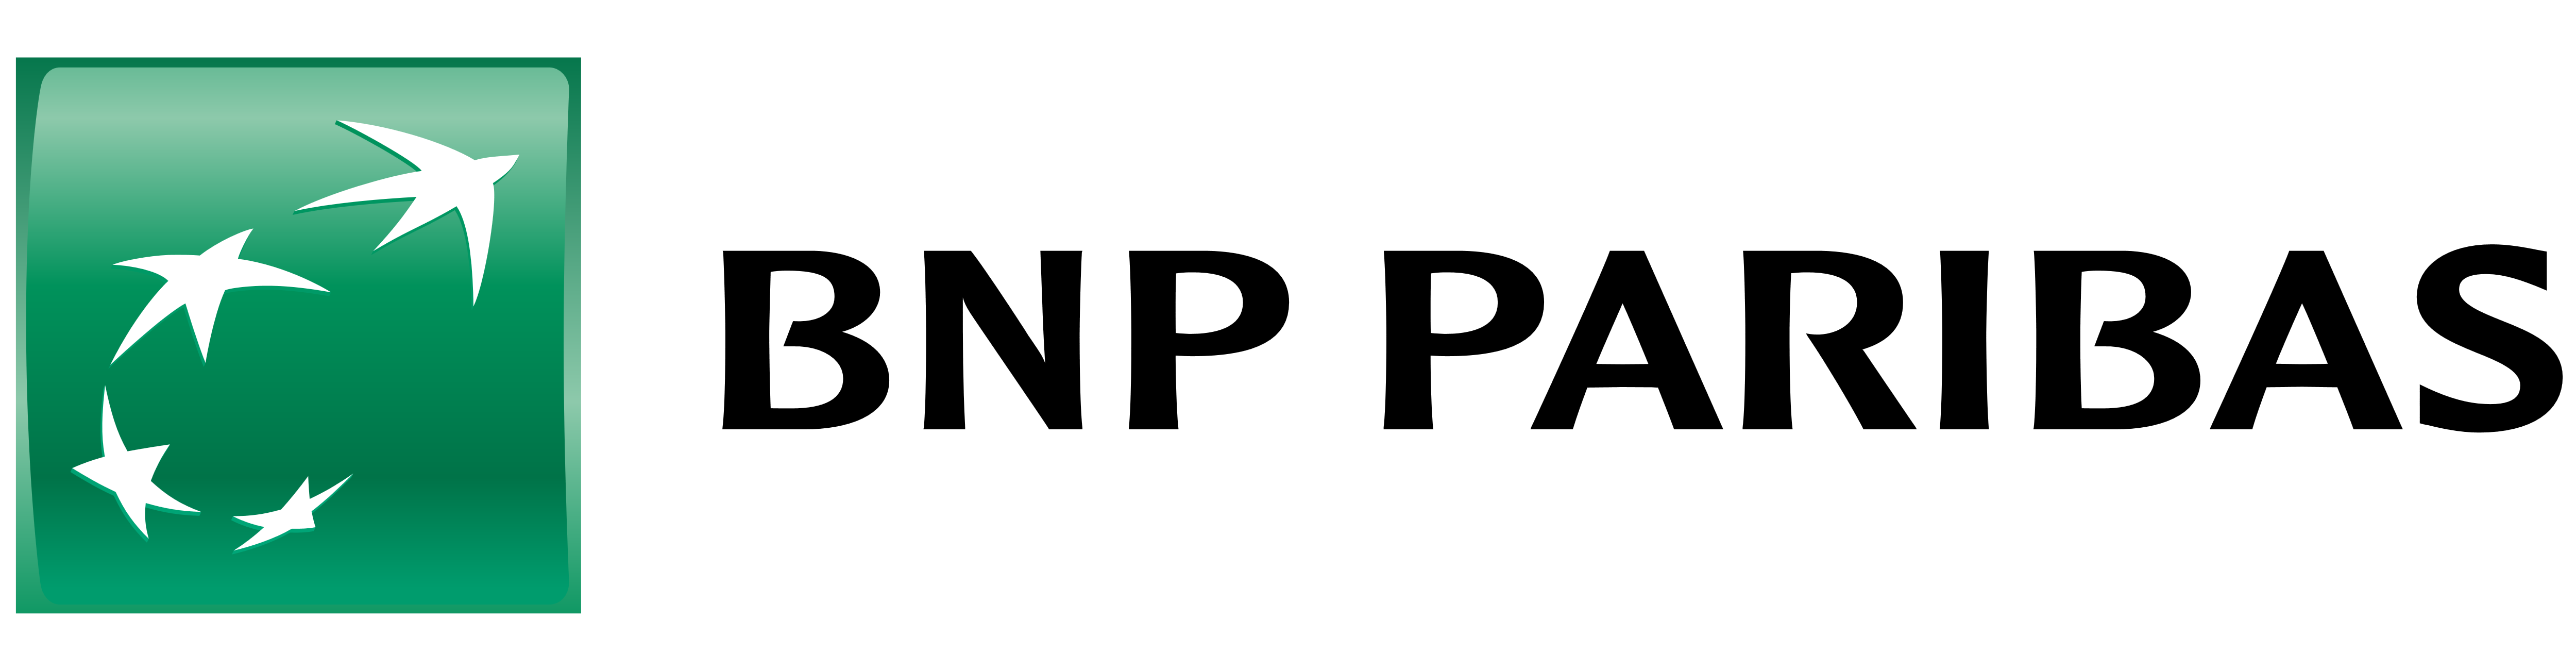 bnp_2020